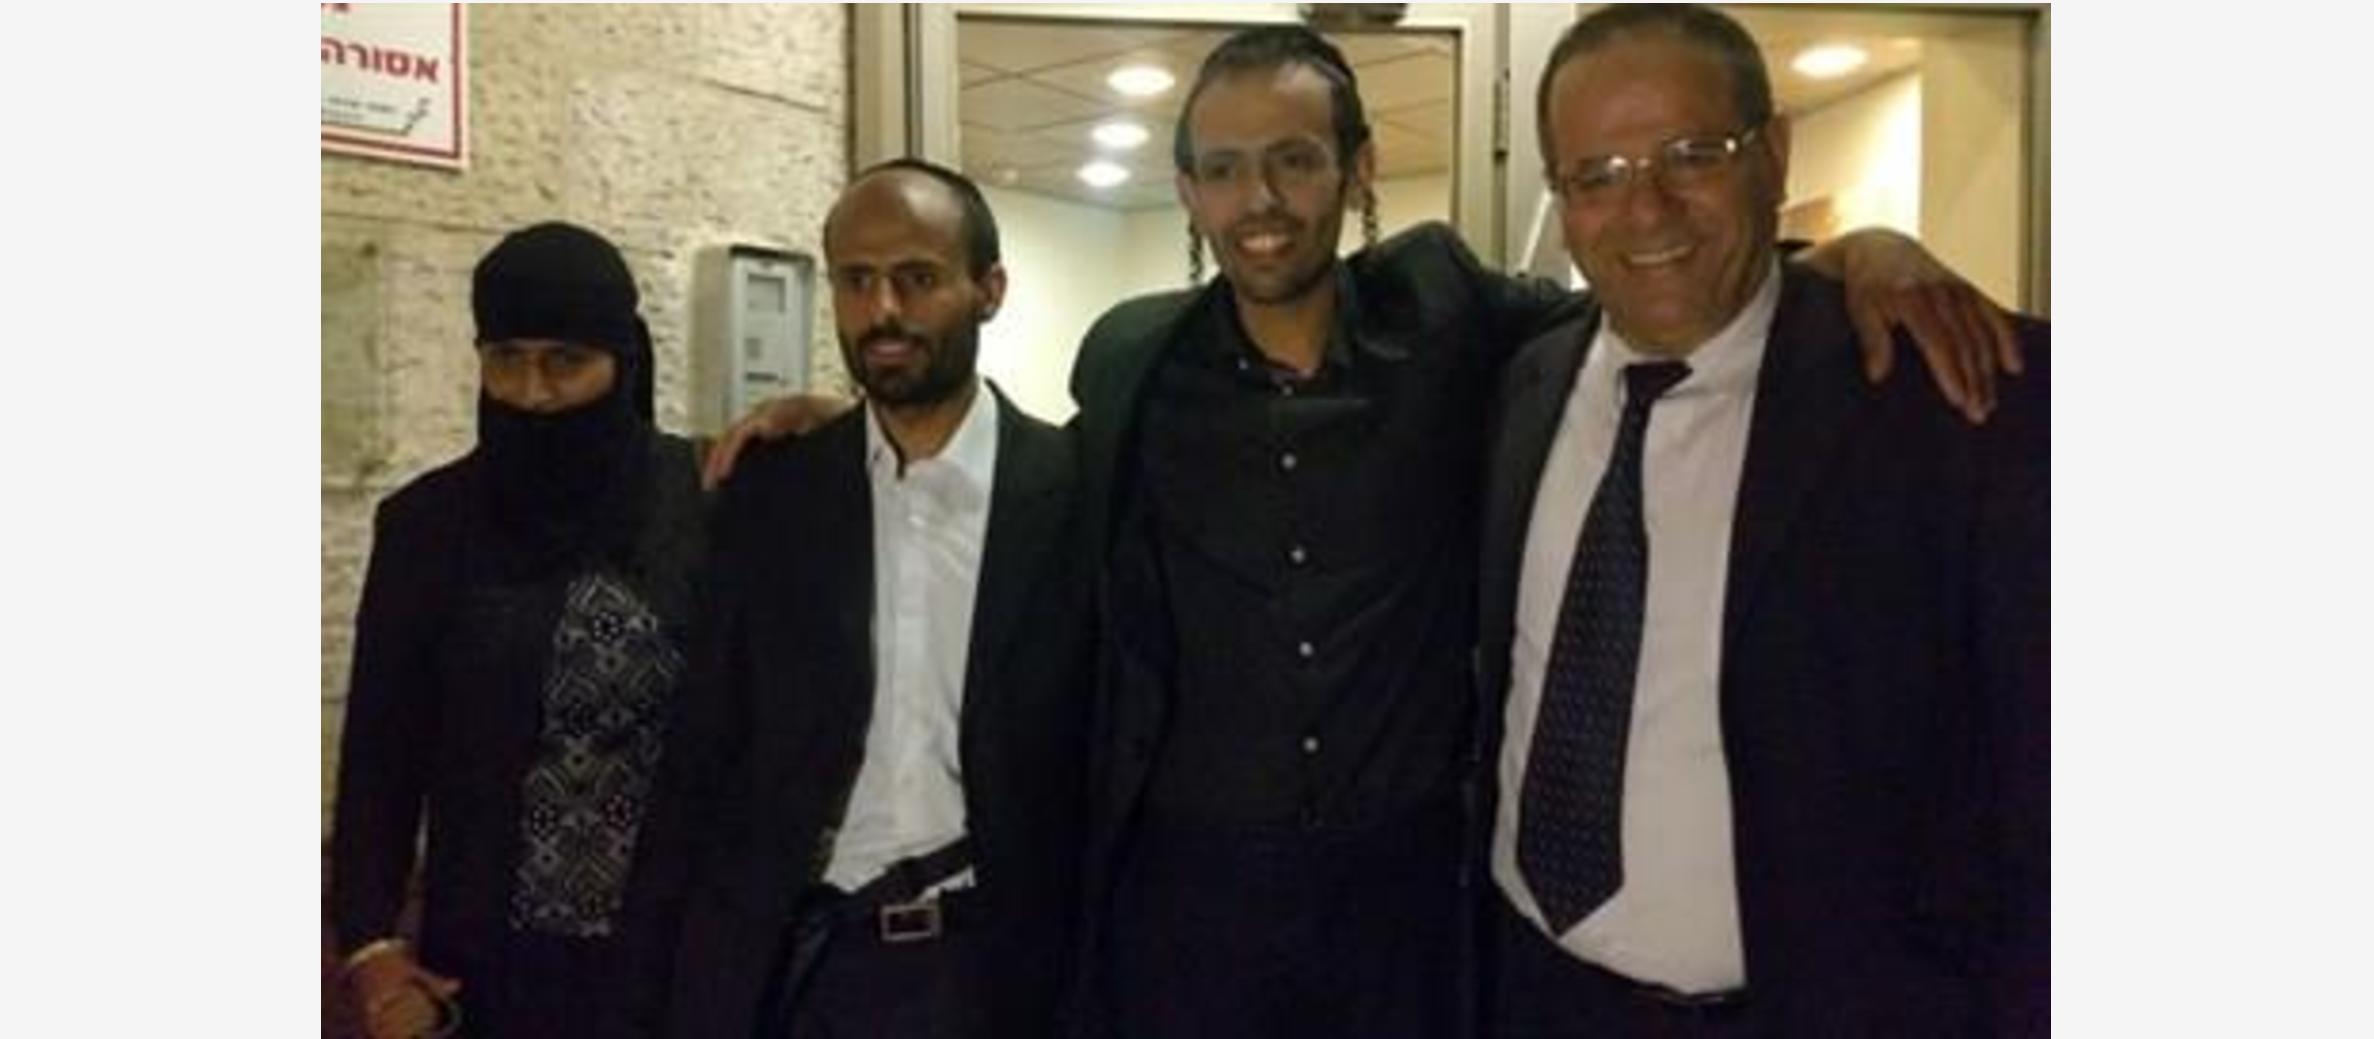 Secret mission rescues last group of Yemen Jews